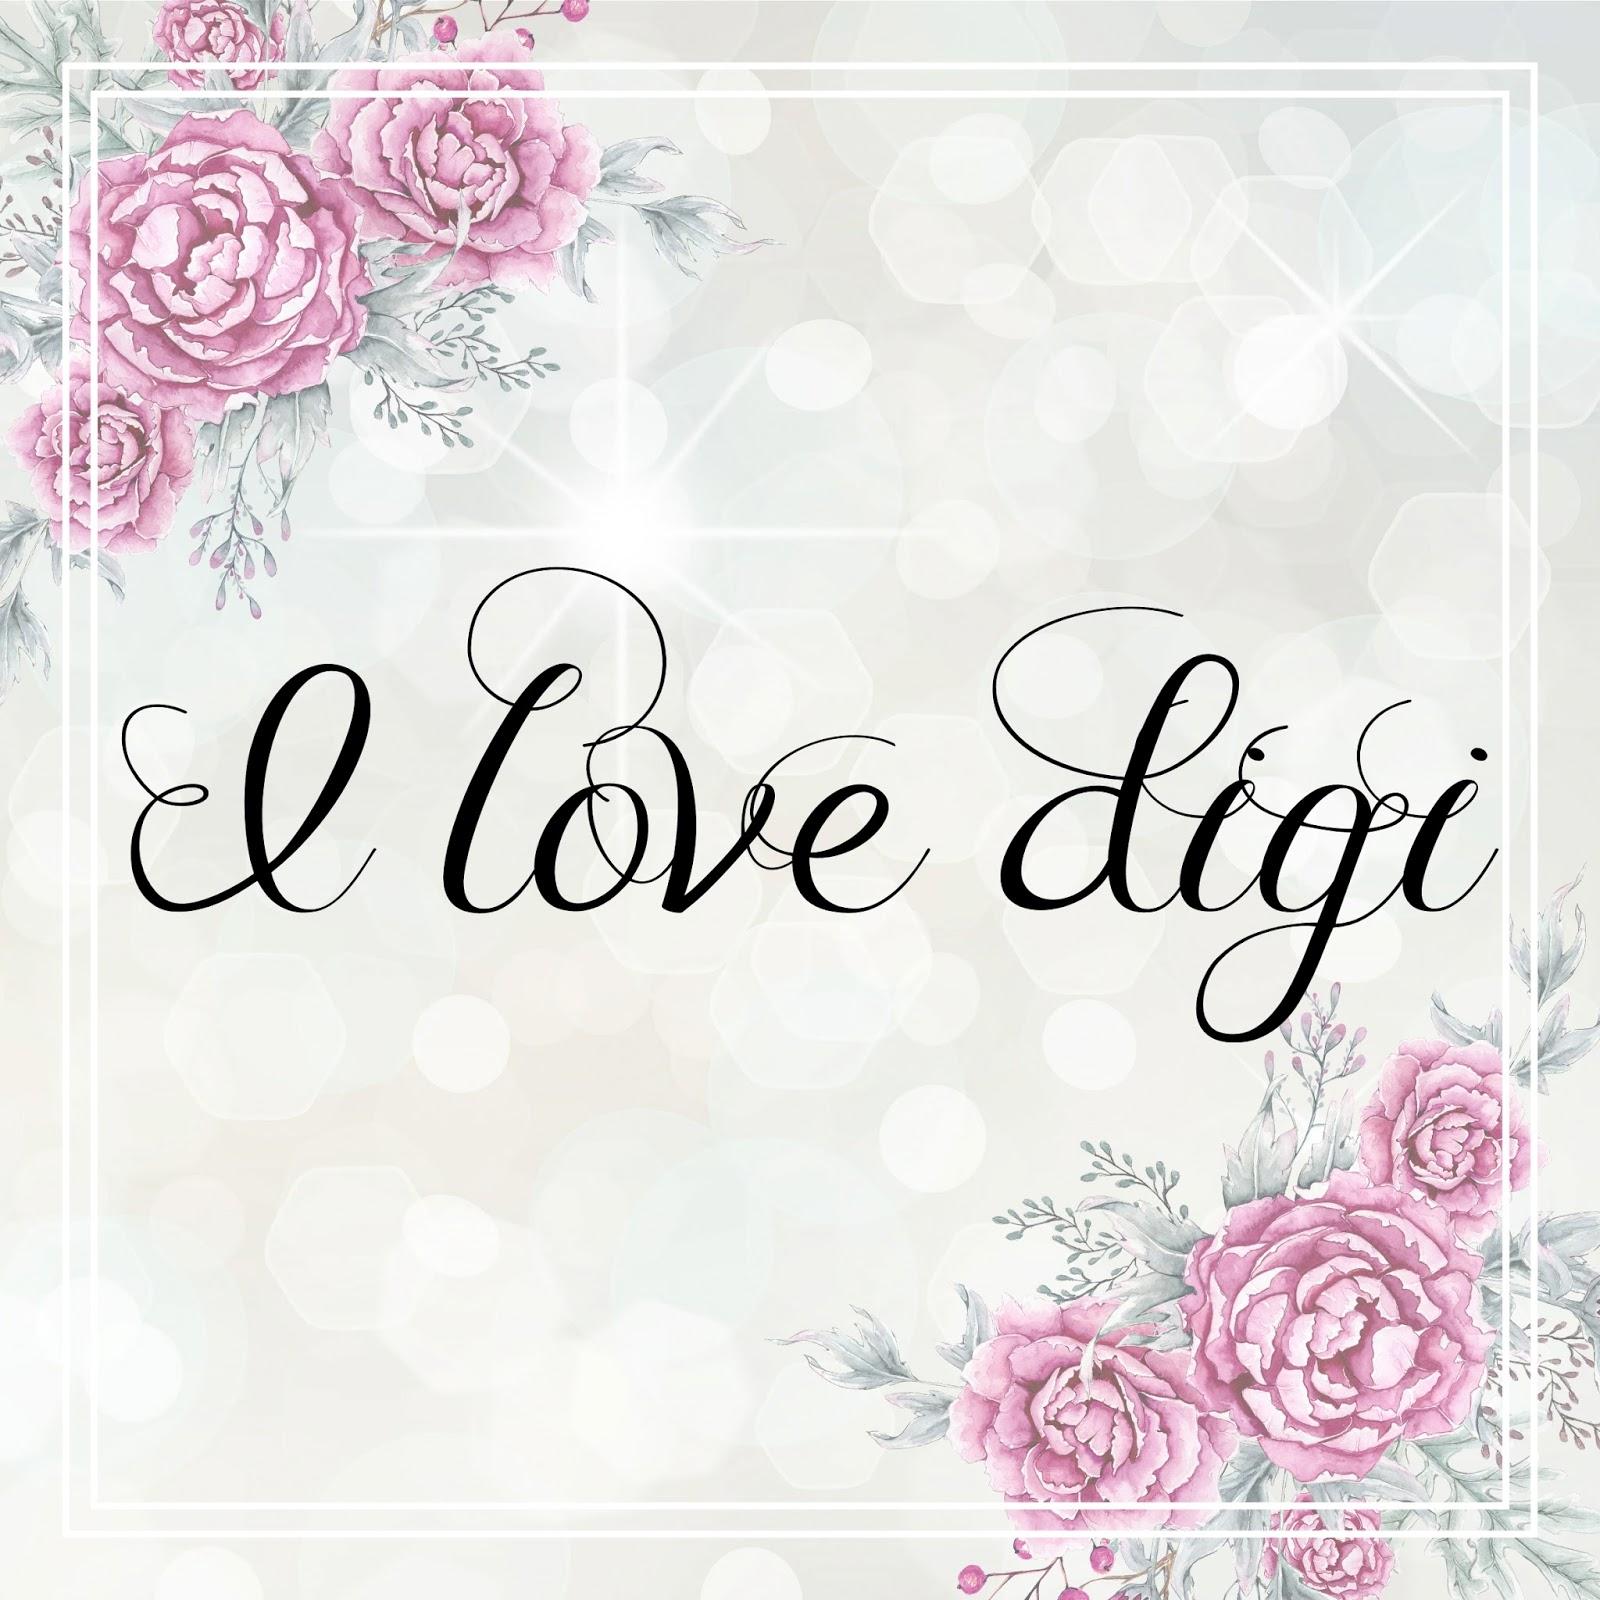 I love digi